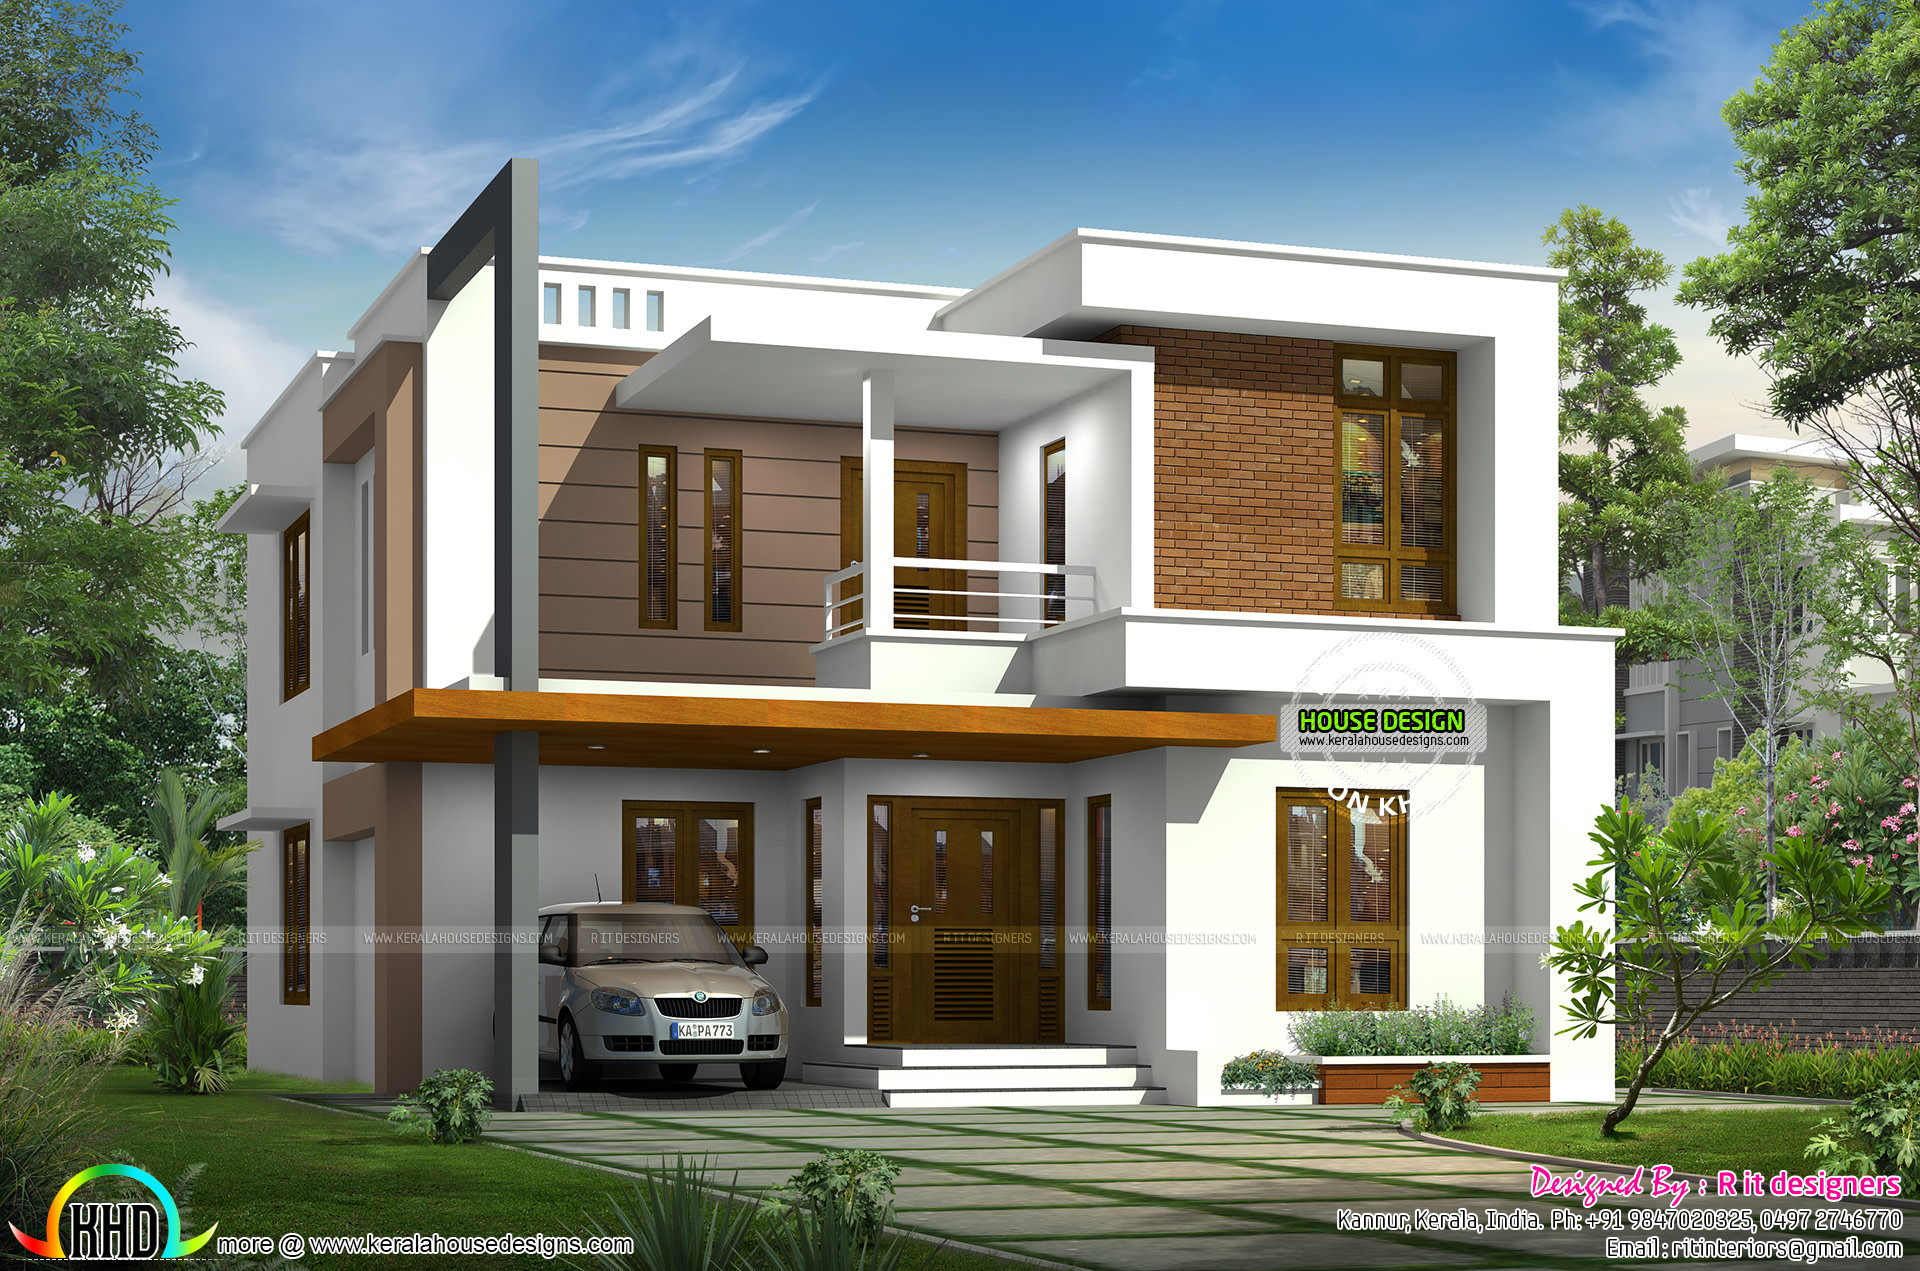 2132 sqft modern 4 bedroom house  Kerala home design and floor plans